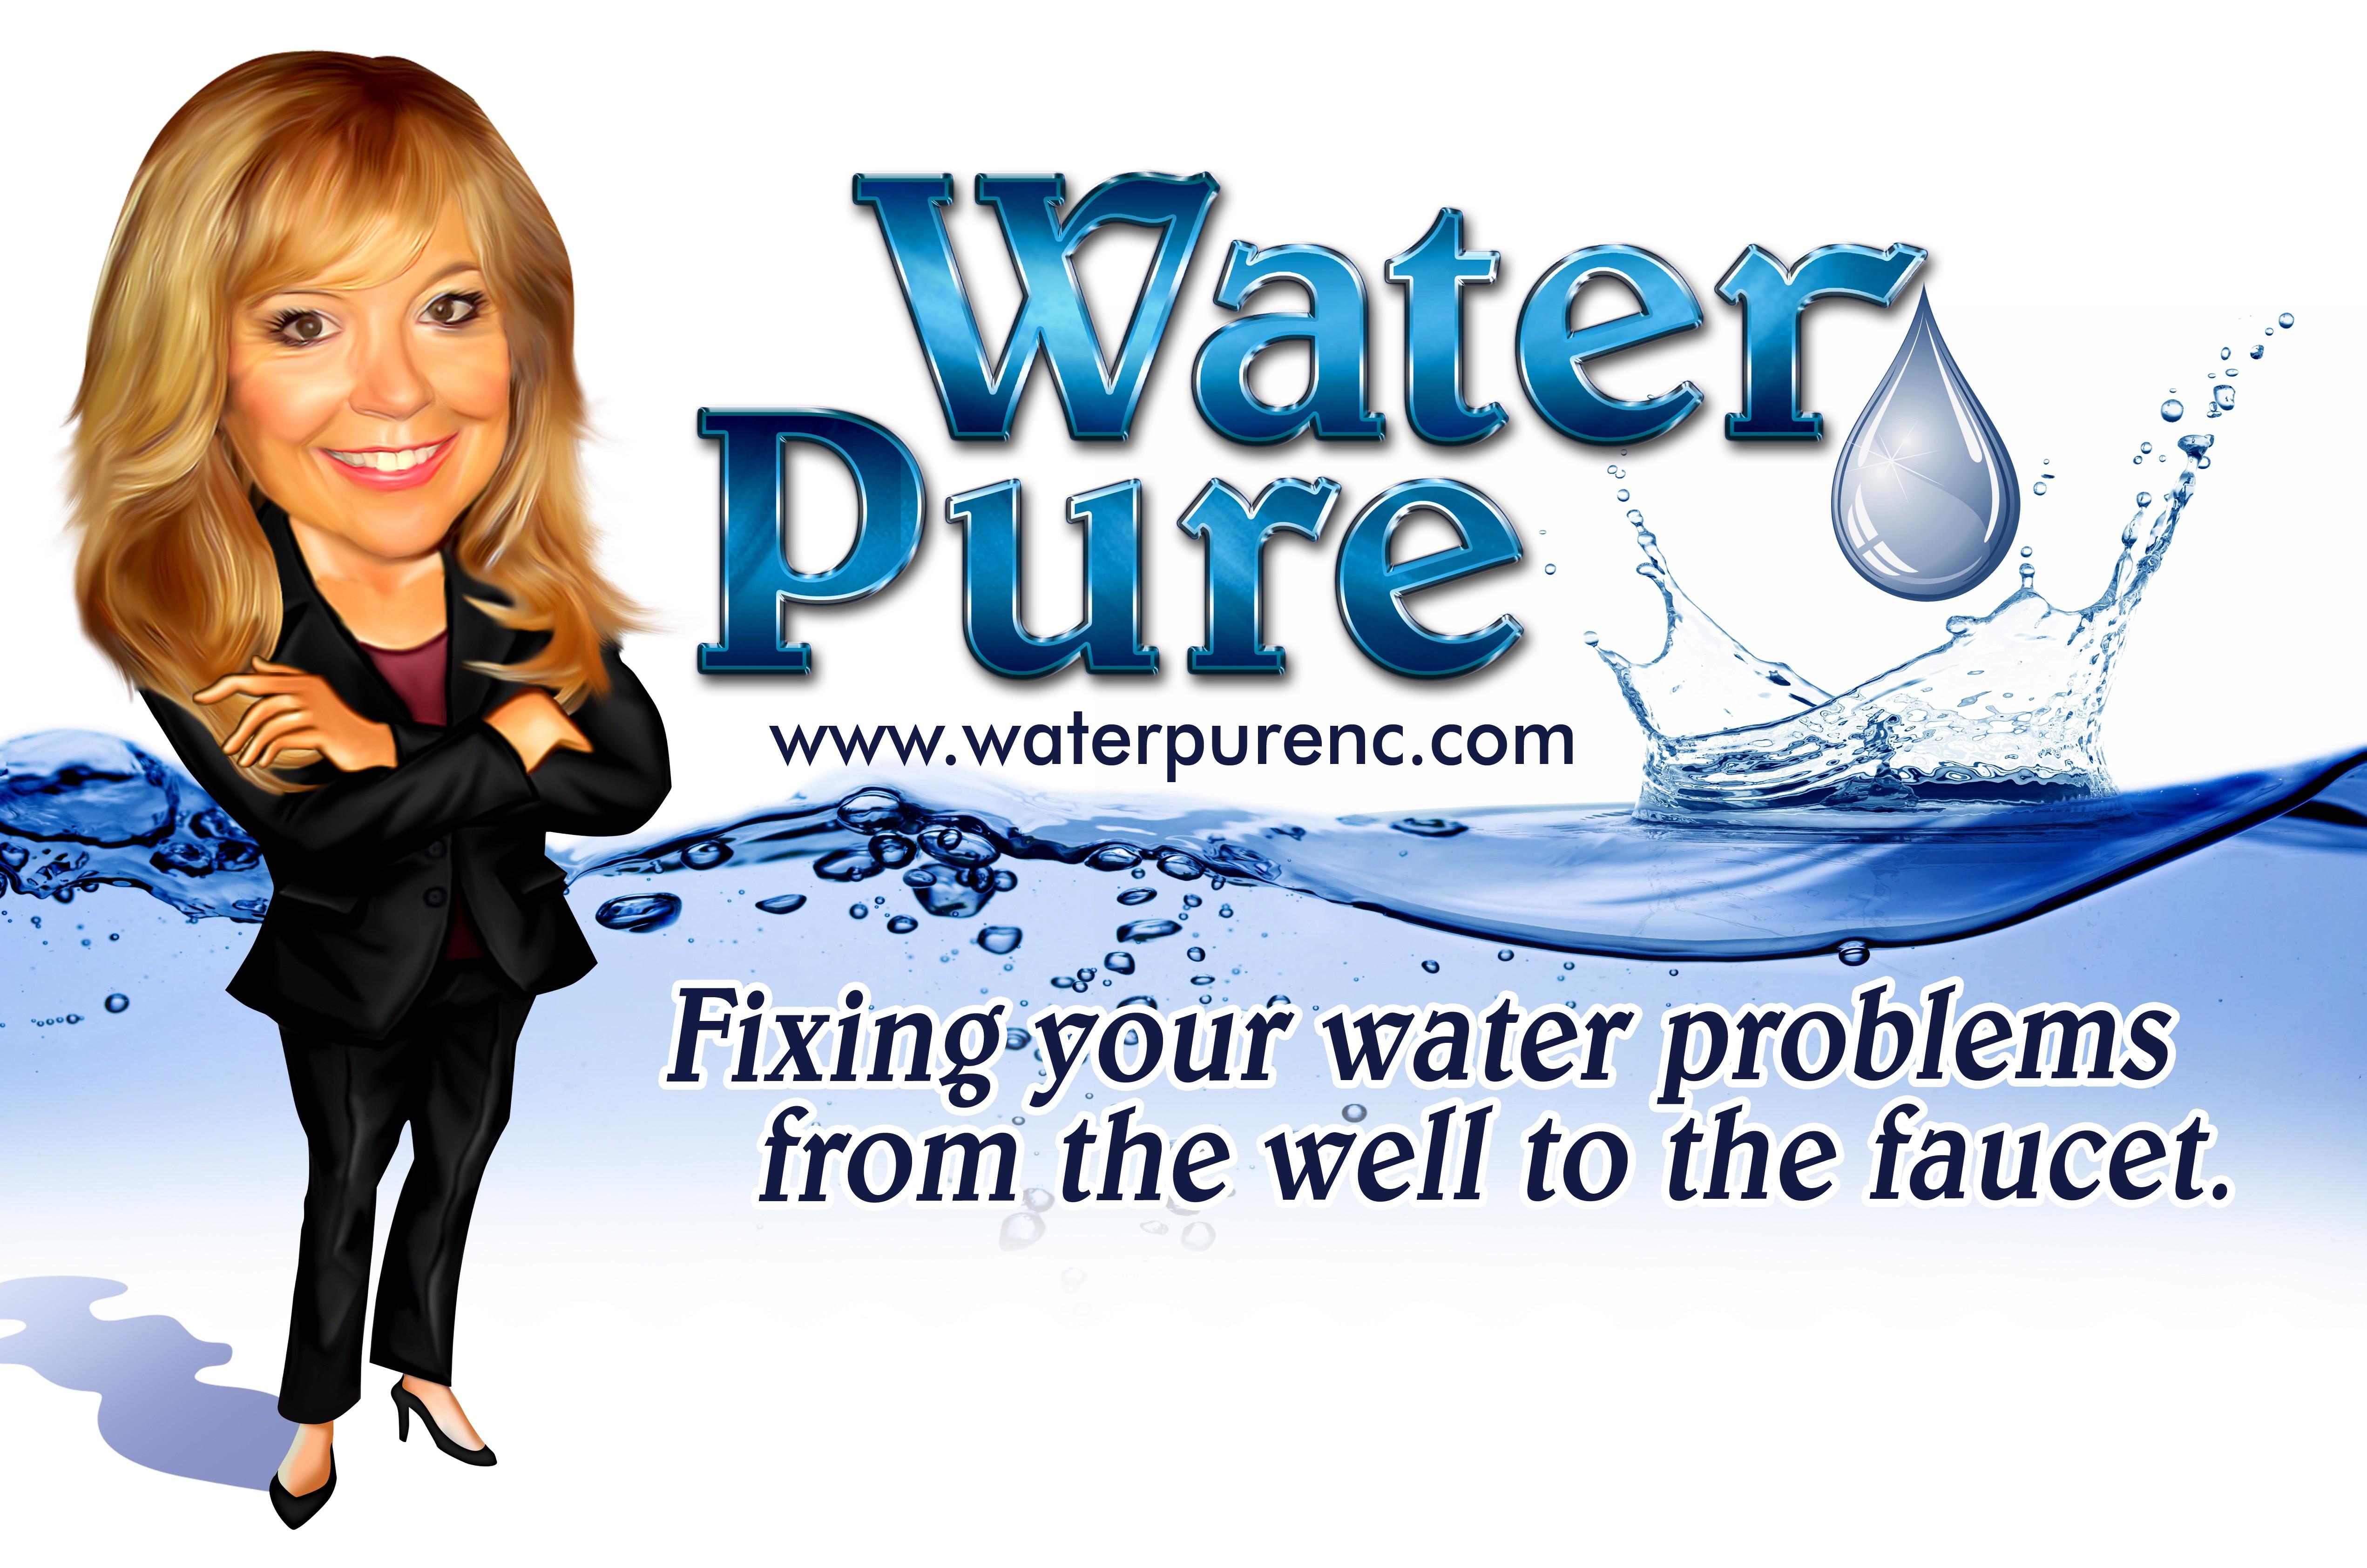 Water Pure Van signage